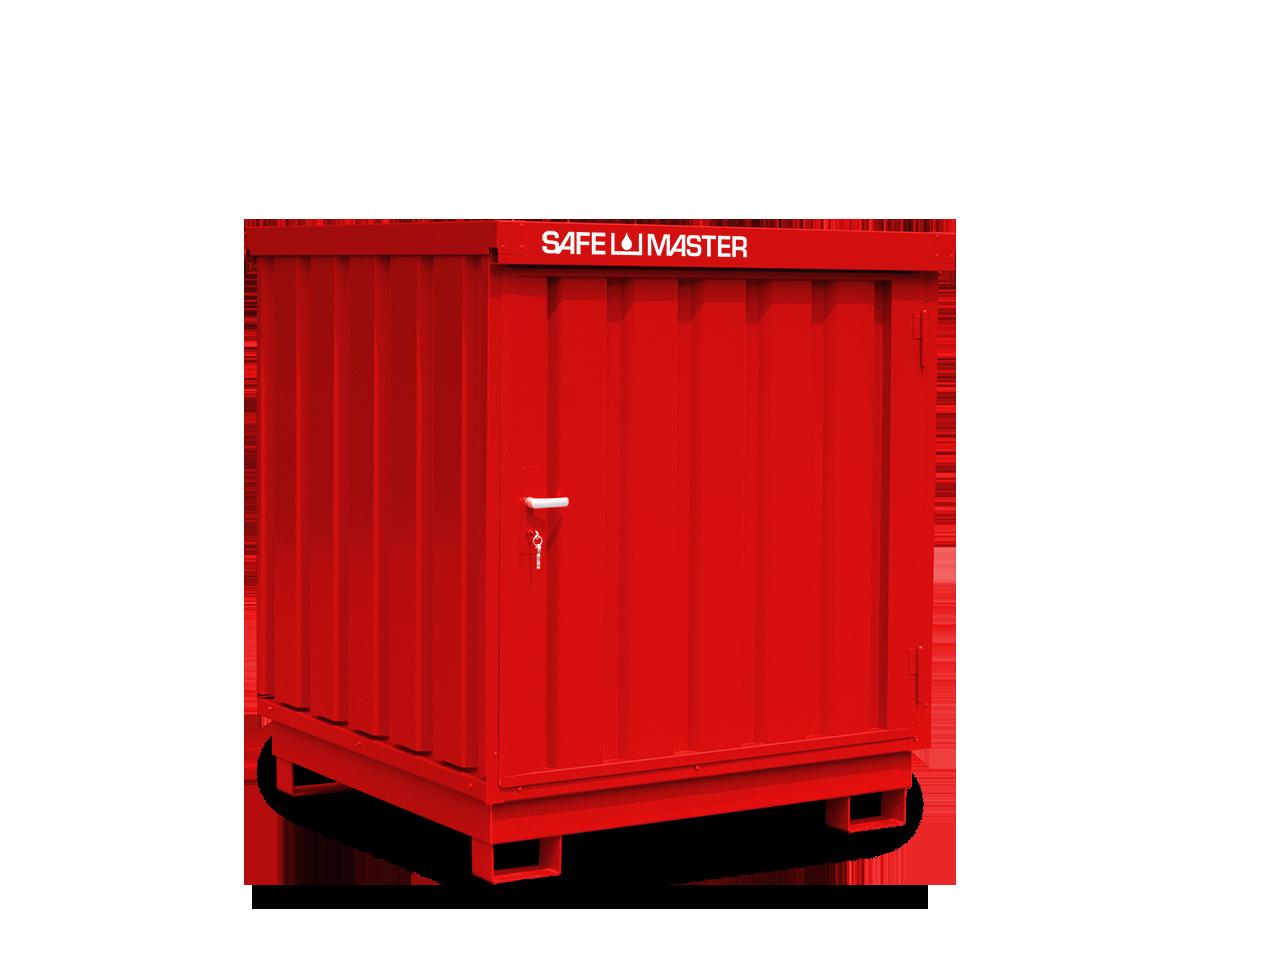 8602_SAFE-Master-Gefahrstoffdepot-4_SM4_RGB_240_ft_sn_sl.png